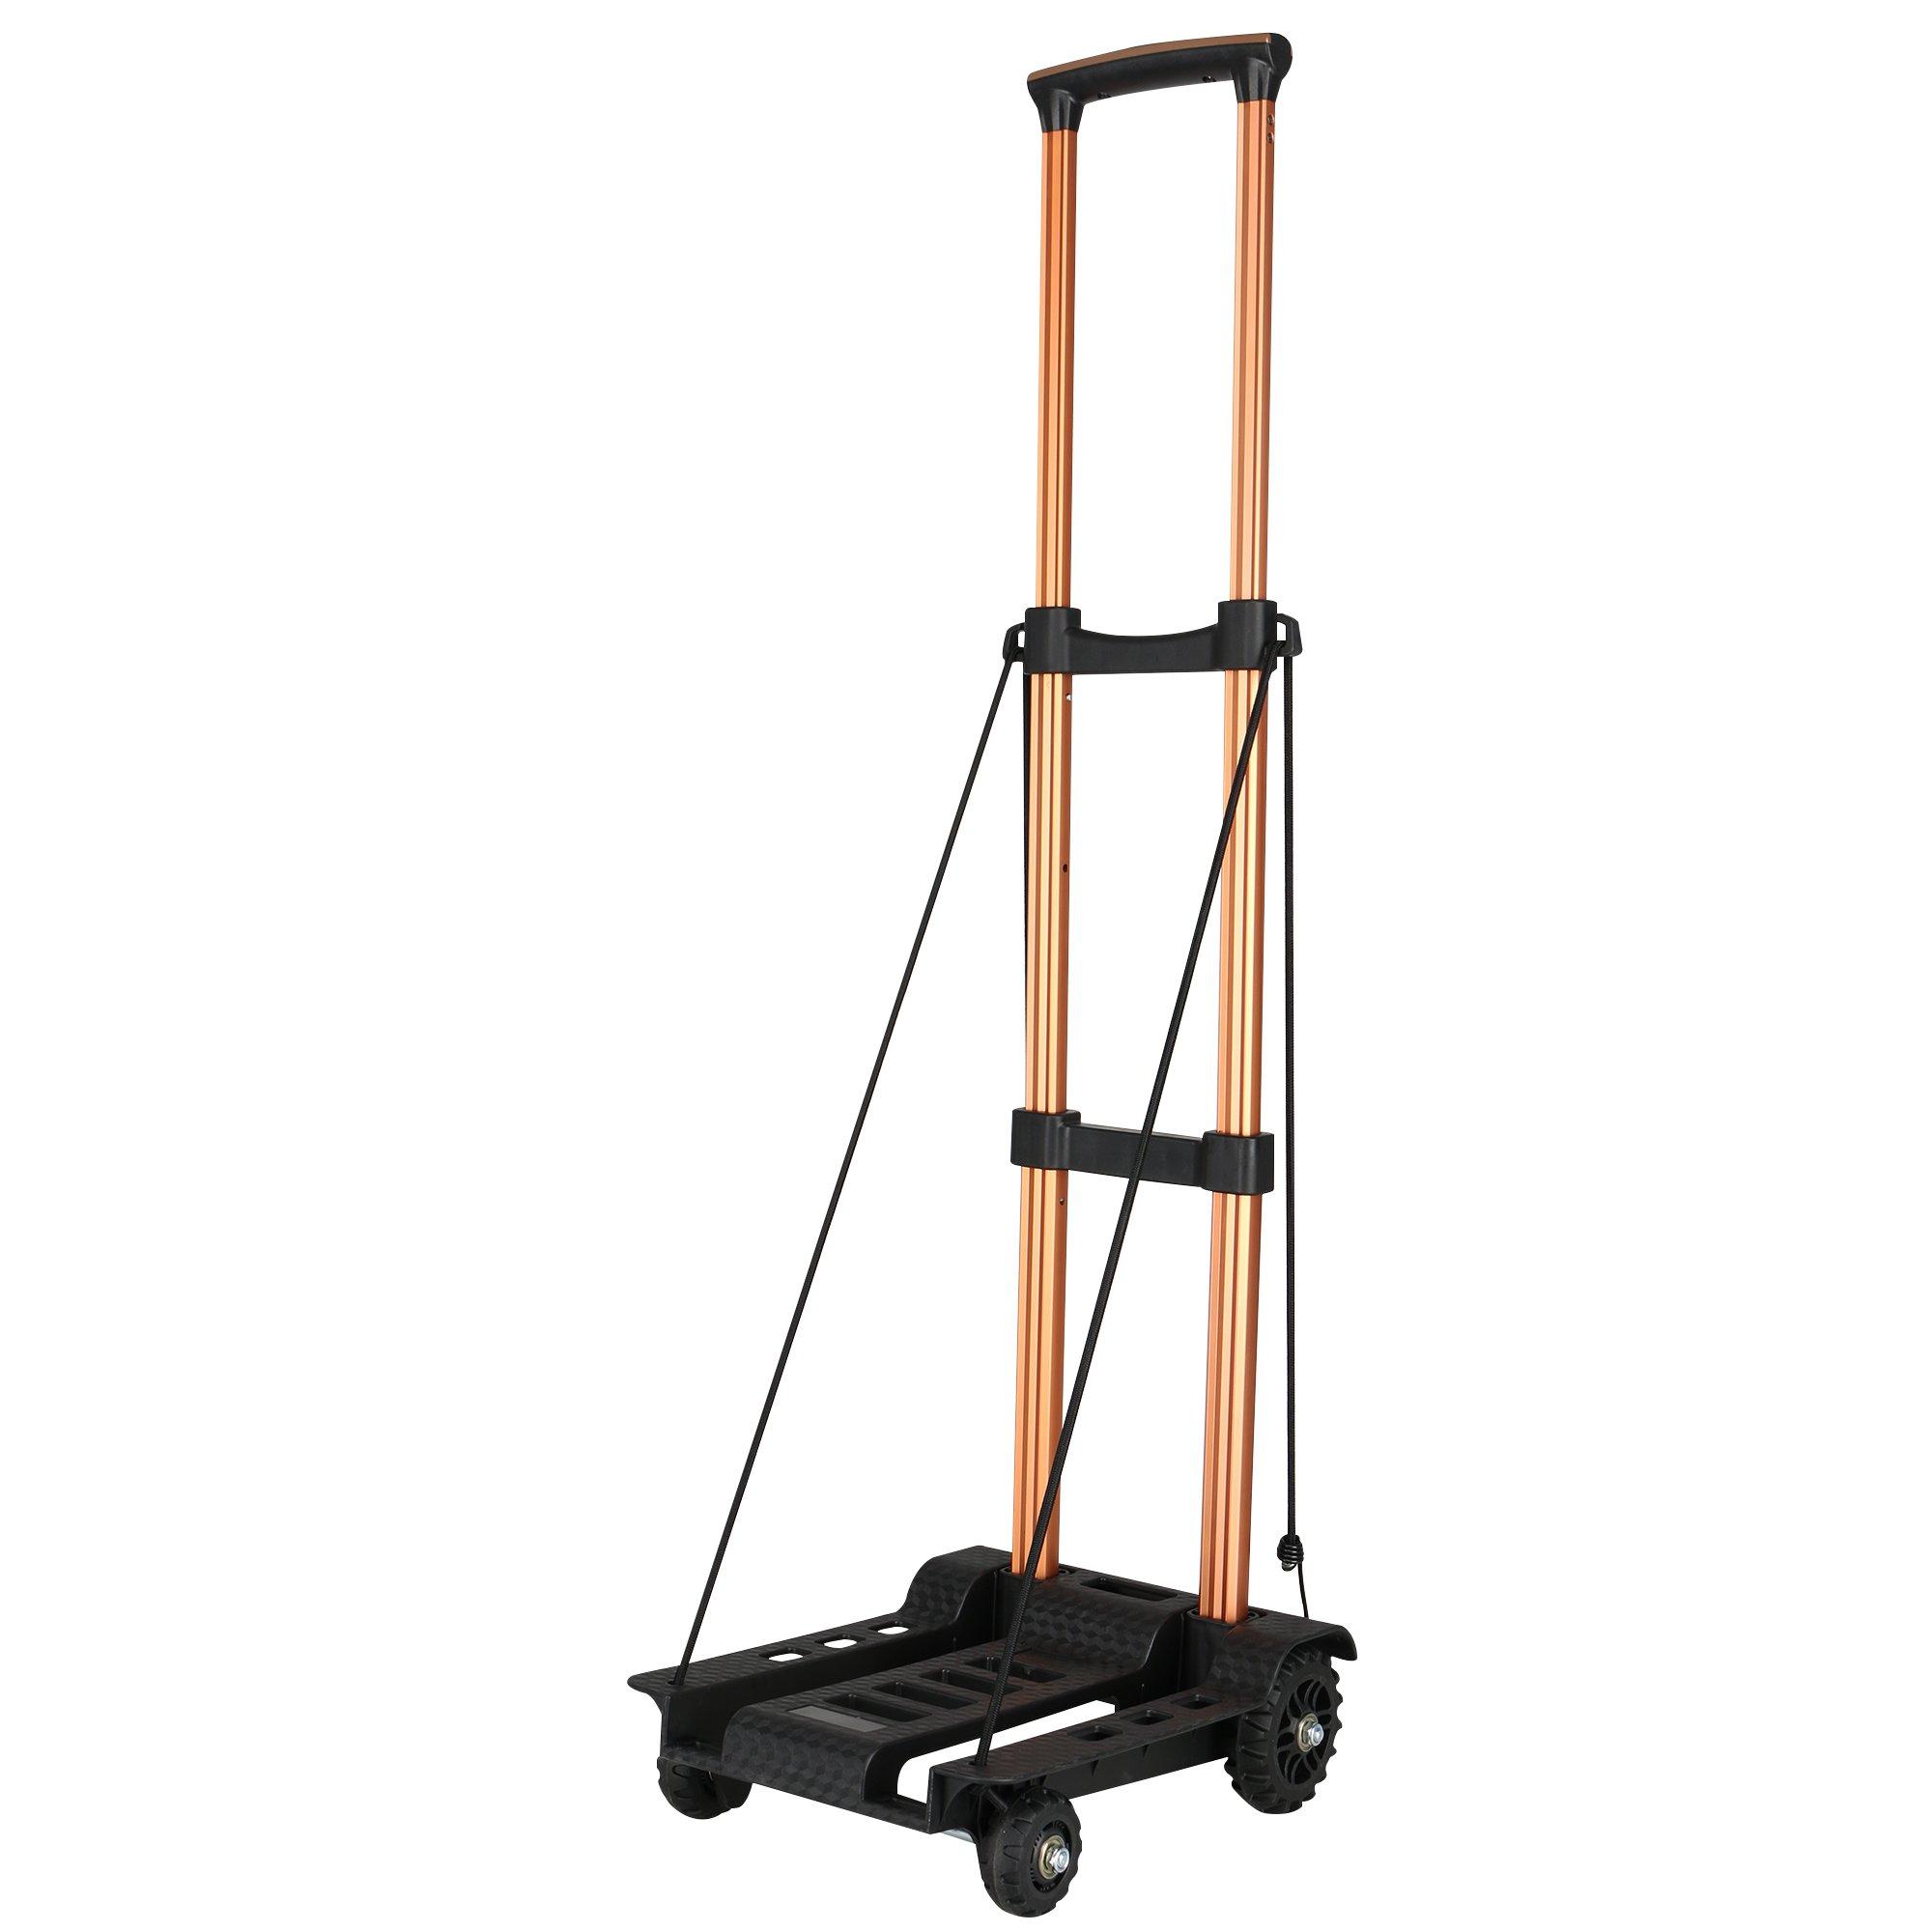 Foldable Luggage Cart Trolley